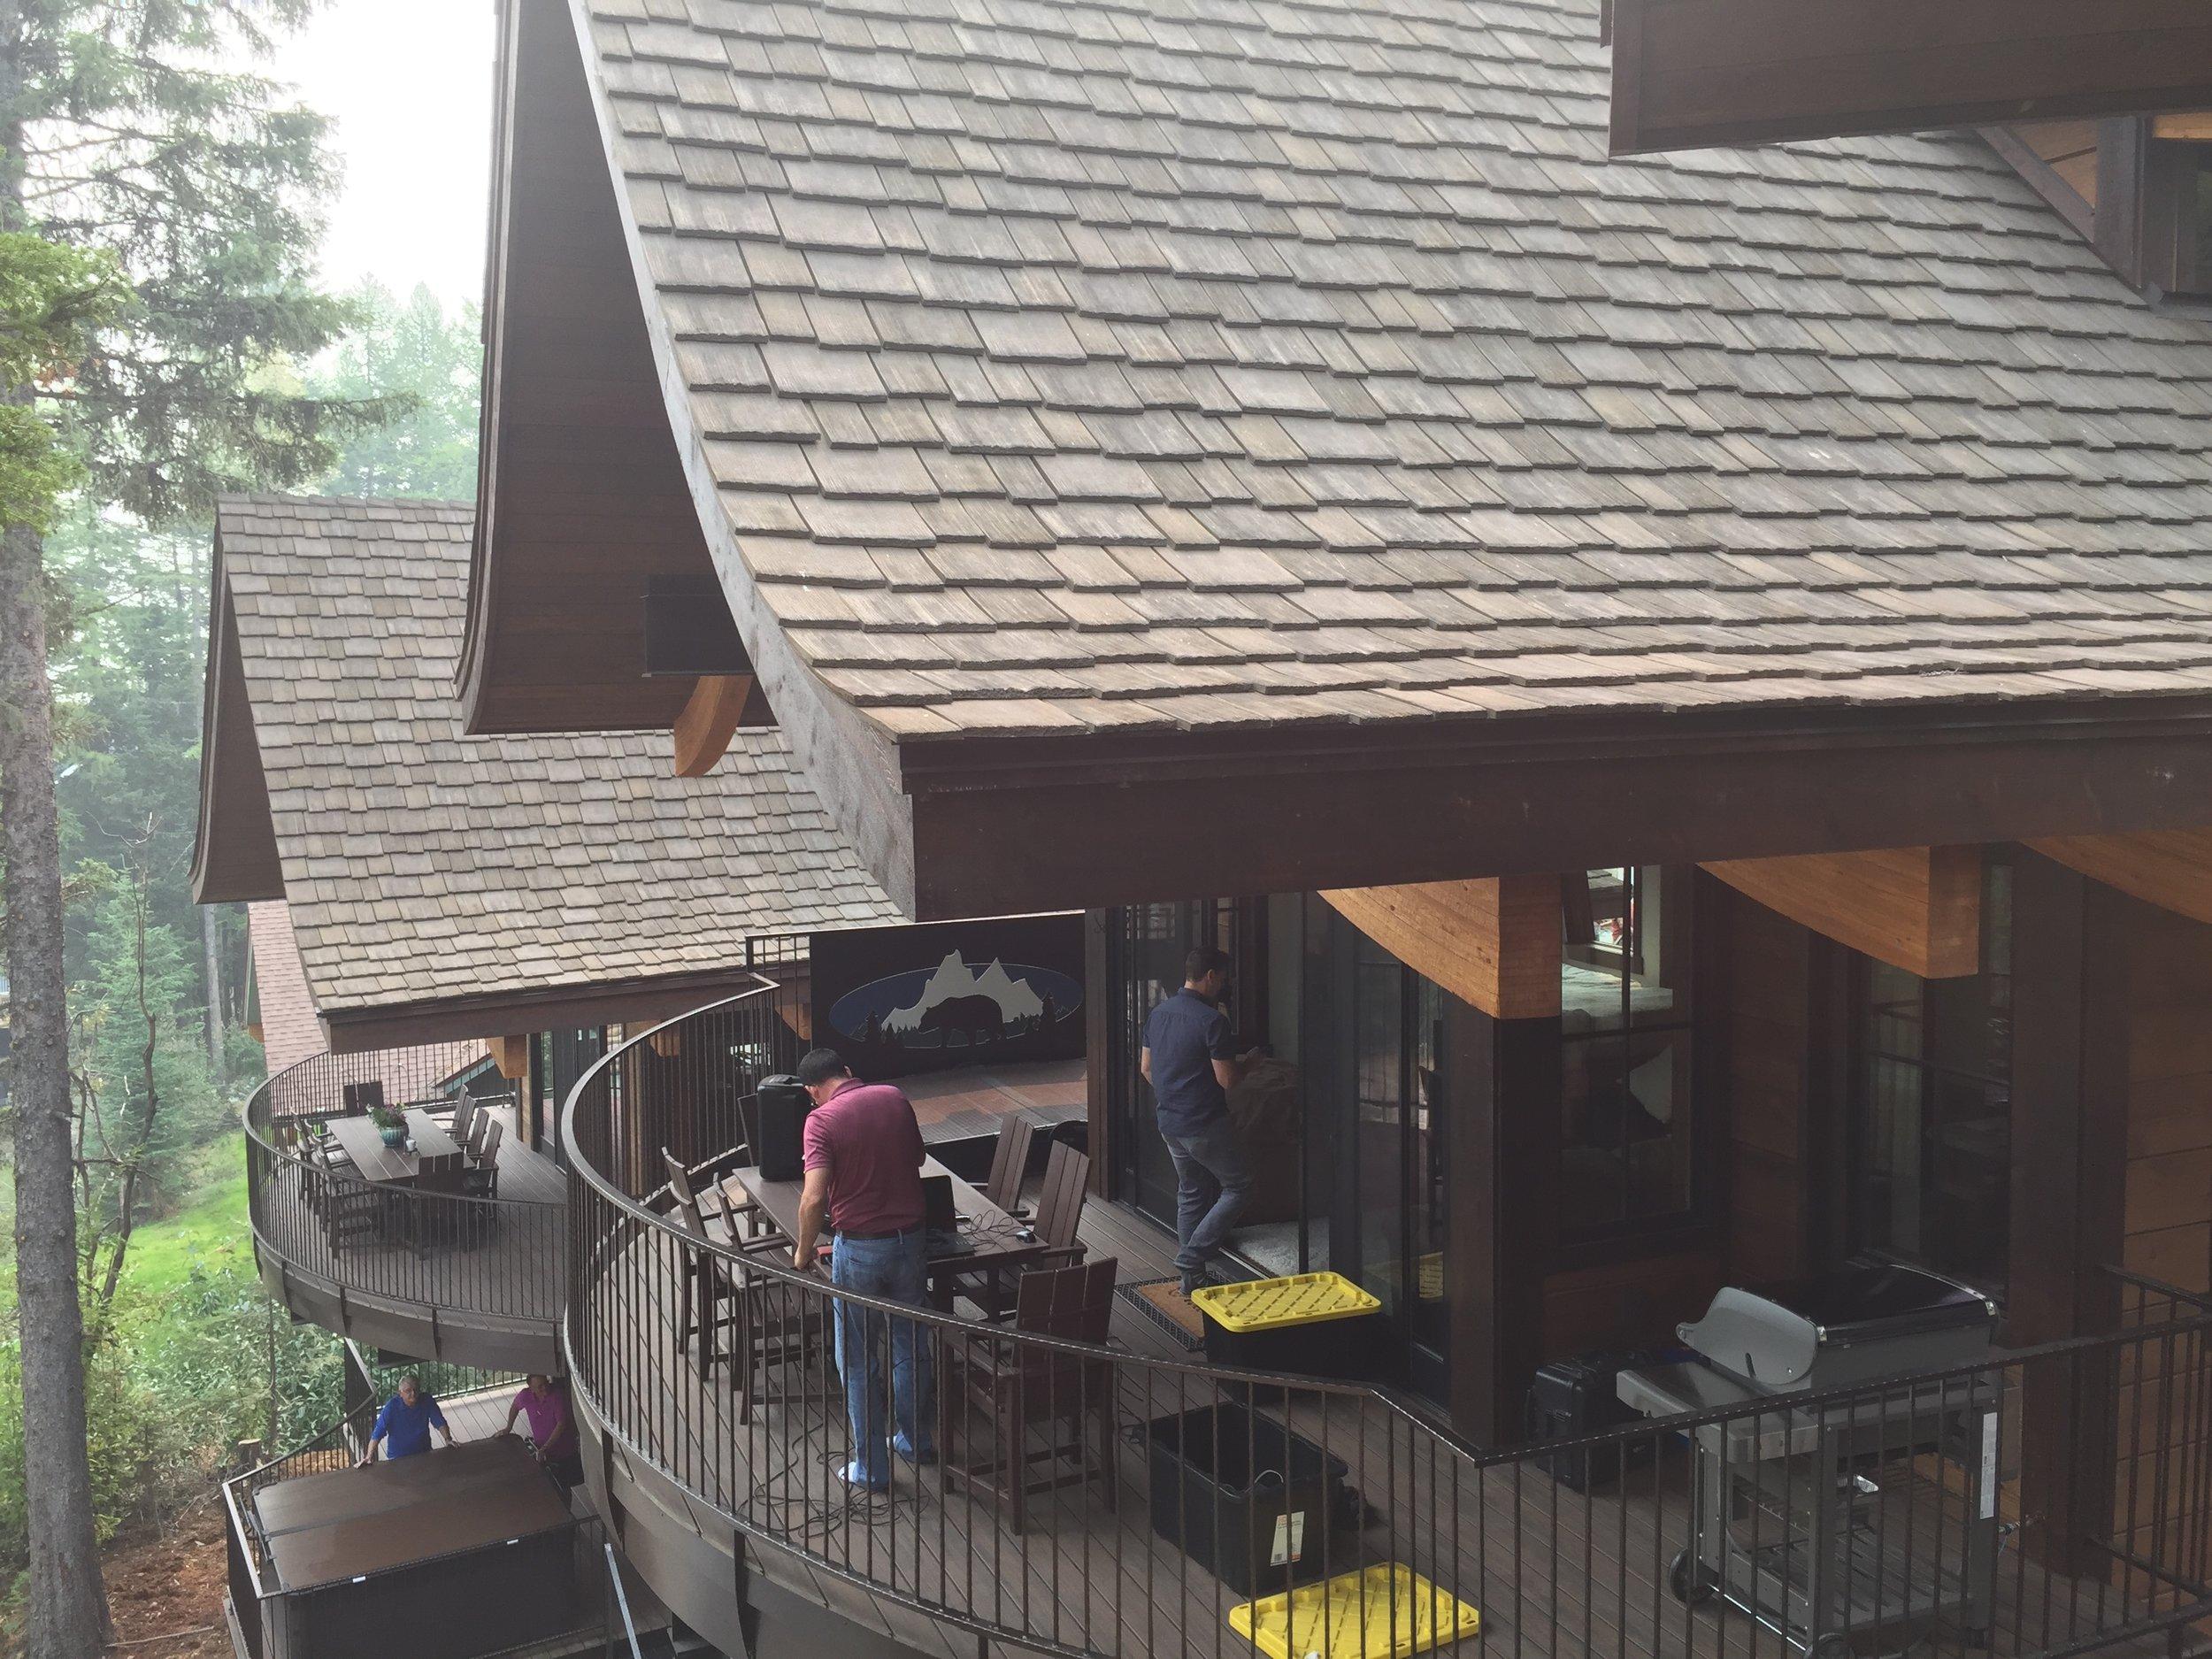 view-of-cedur-roof-snow-bear-chalets-whitefish-montana-ski-resort-hope-slope-inside-treehouse-view.jpg